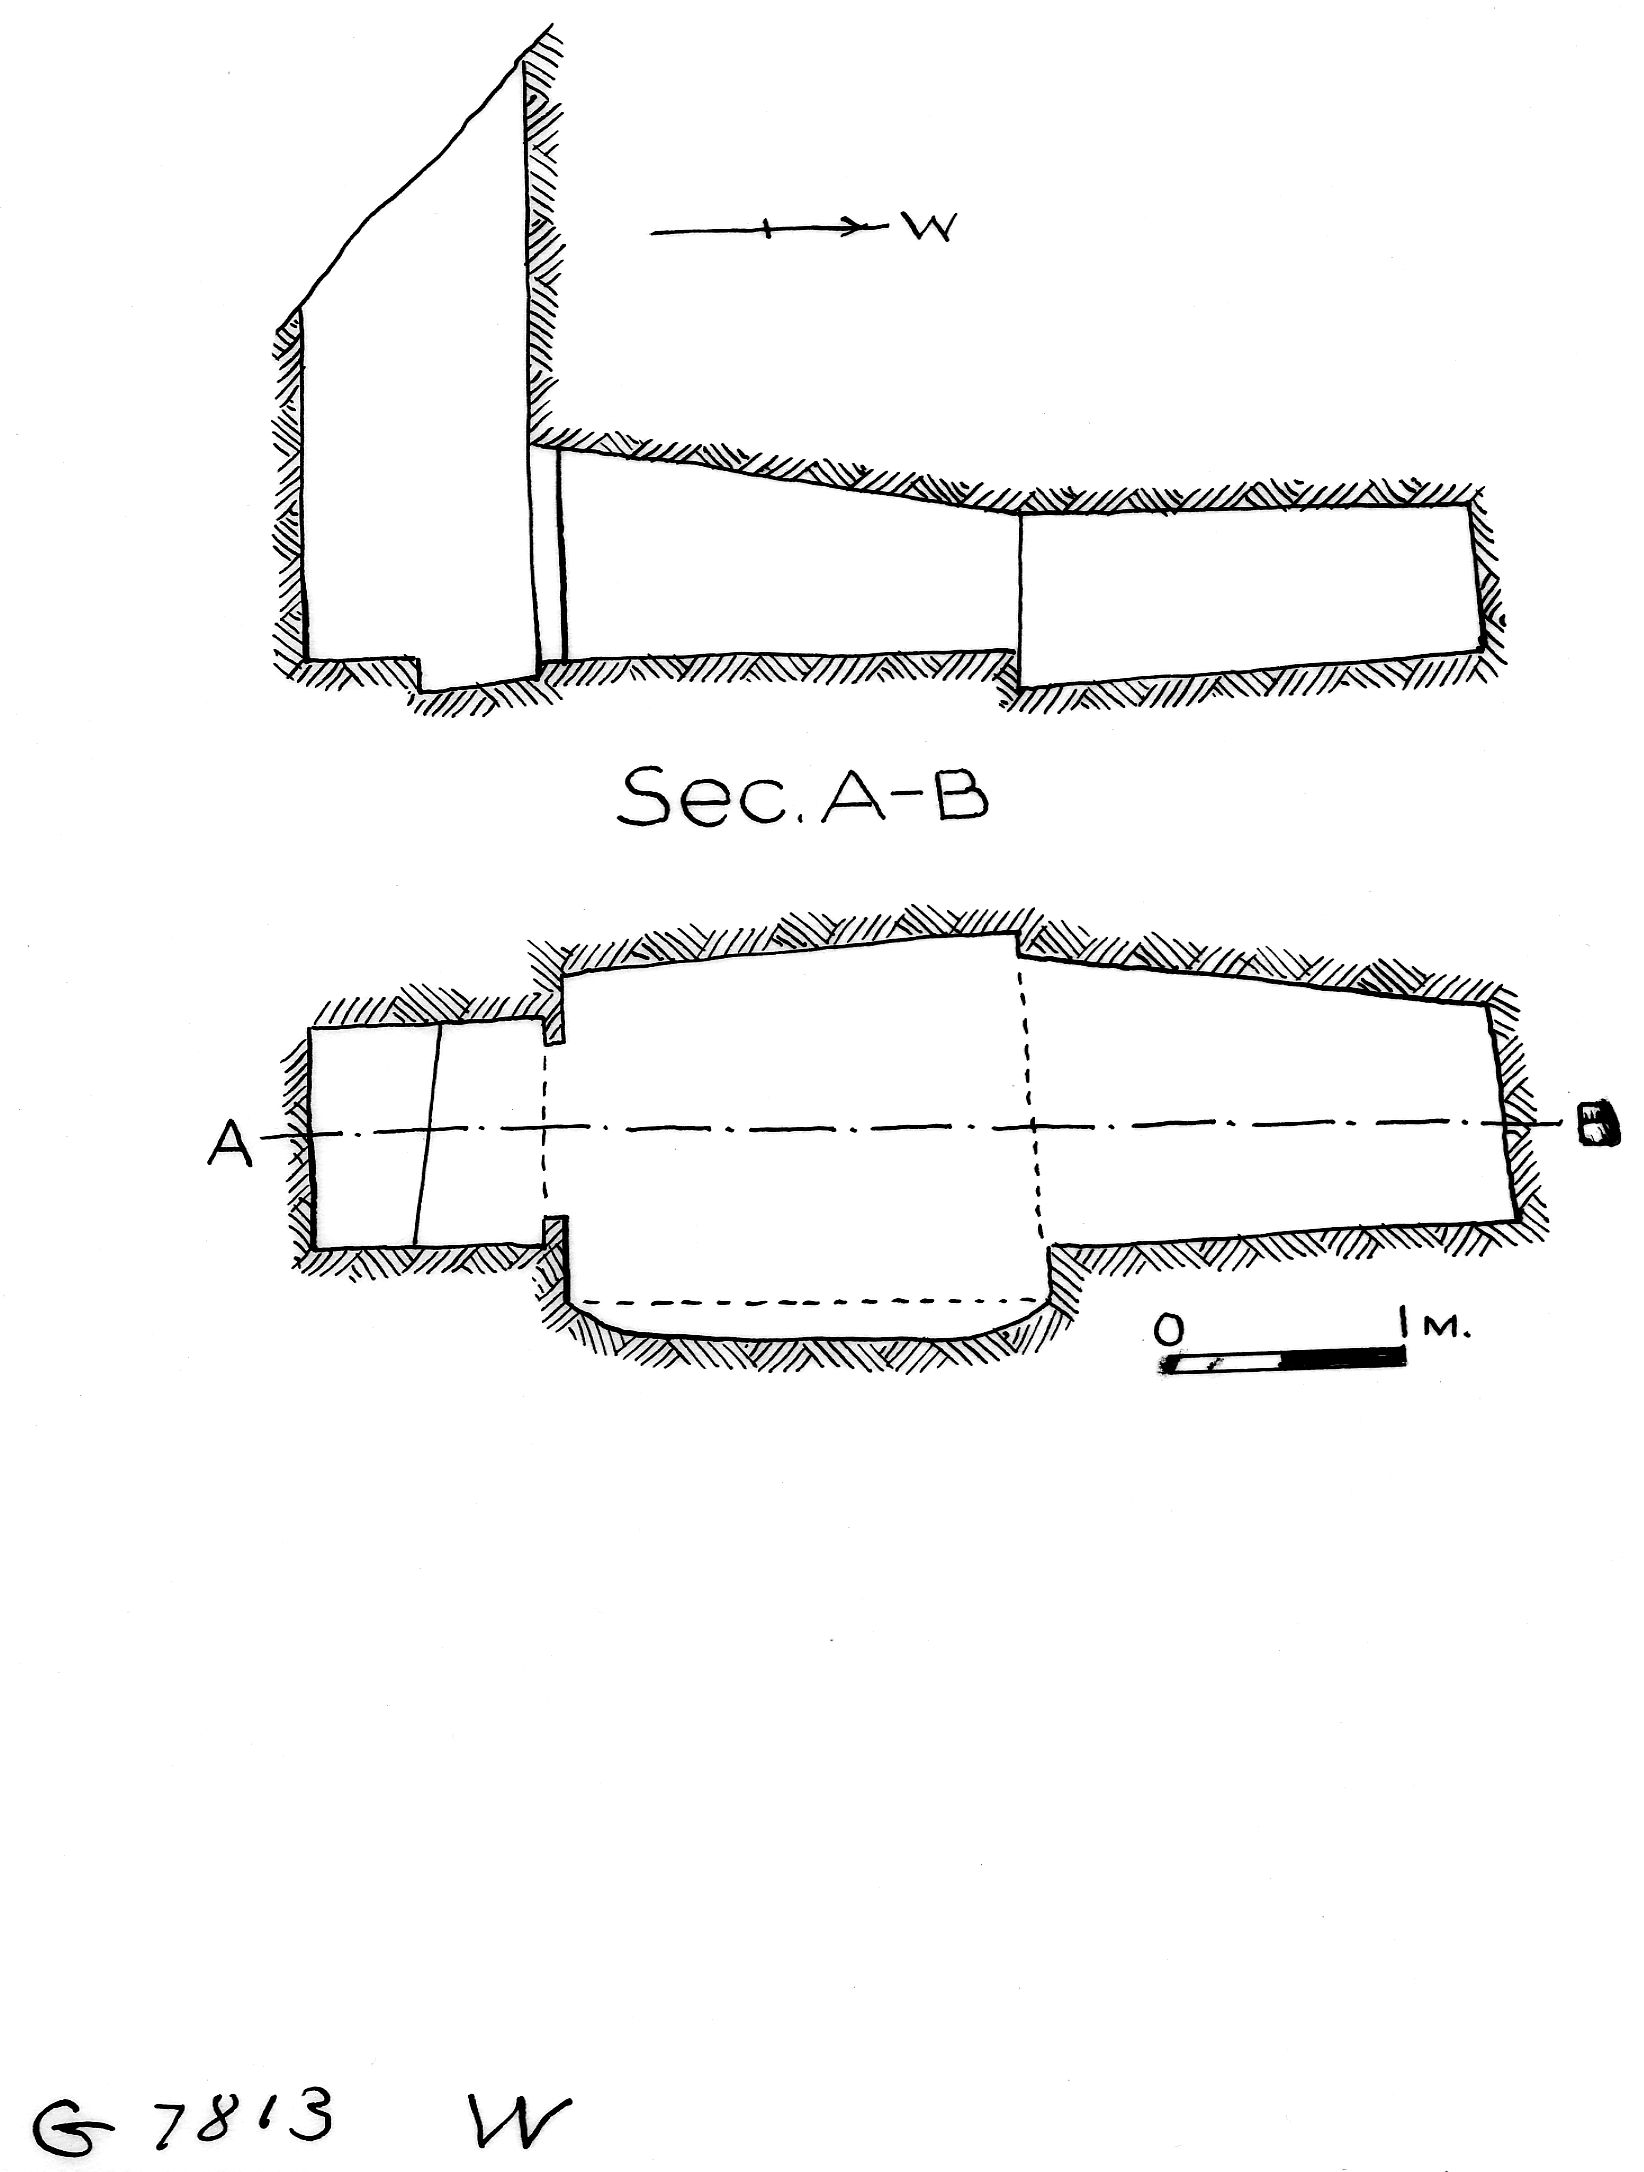 Maps and plans: G 7813, Shaft Wa